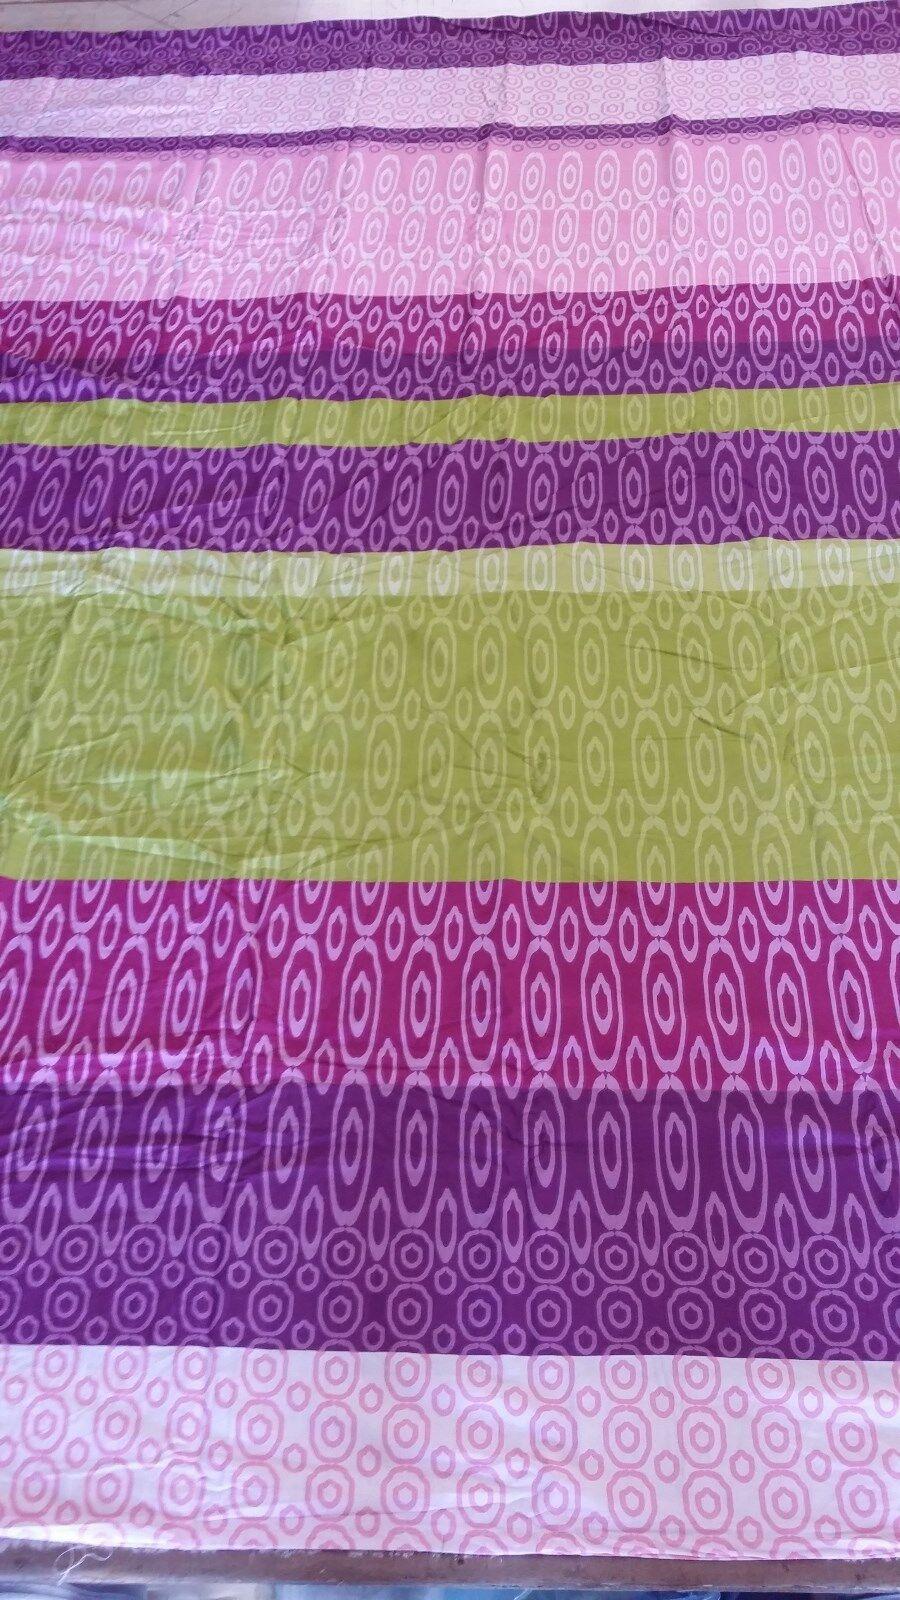 lila Stripes 100% Cotton Waterbed Sheet Set Pole Attachment - all Größes, Print